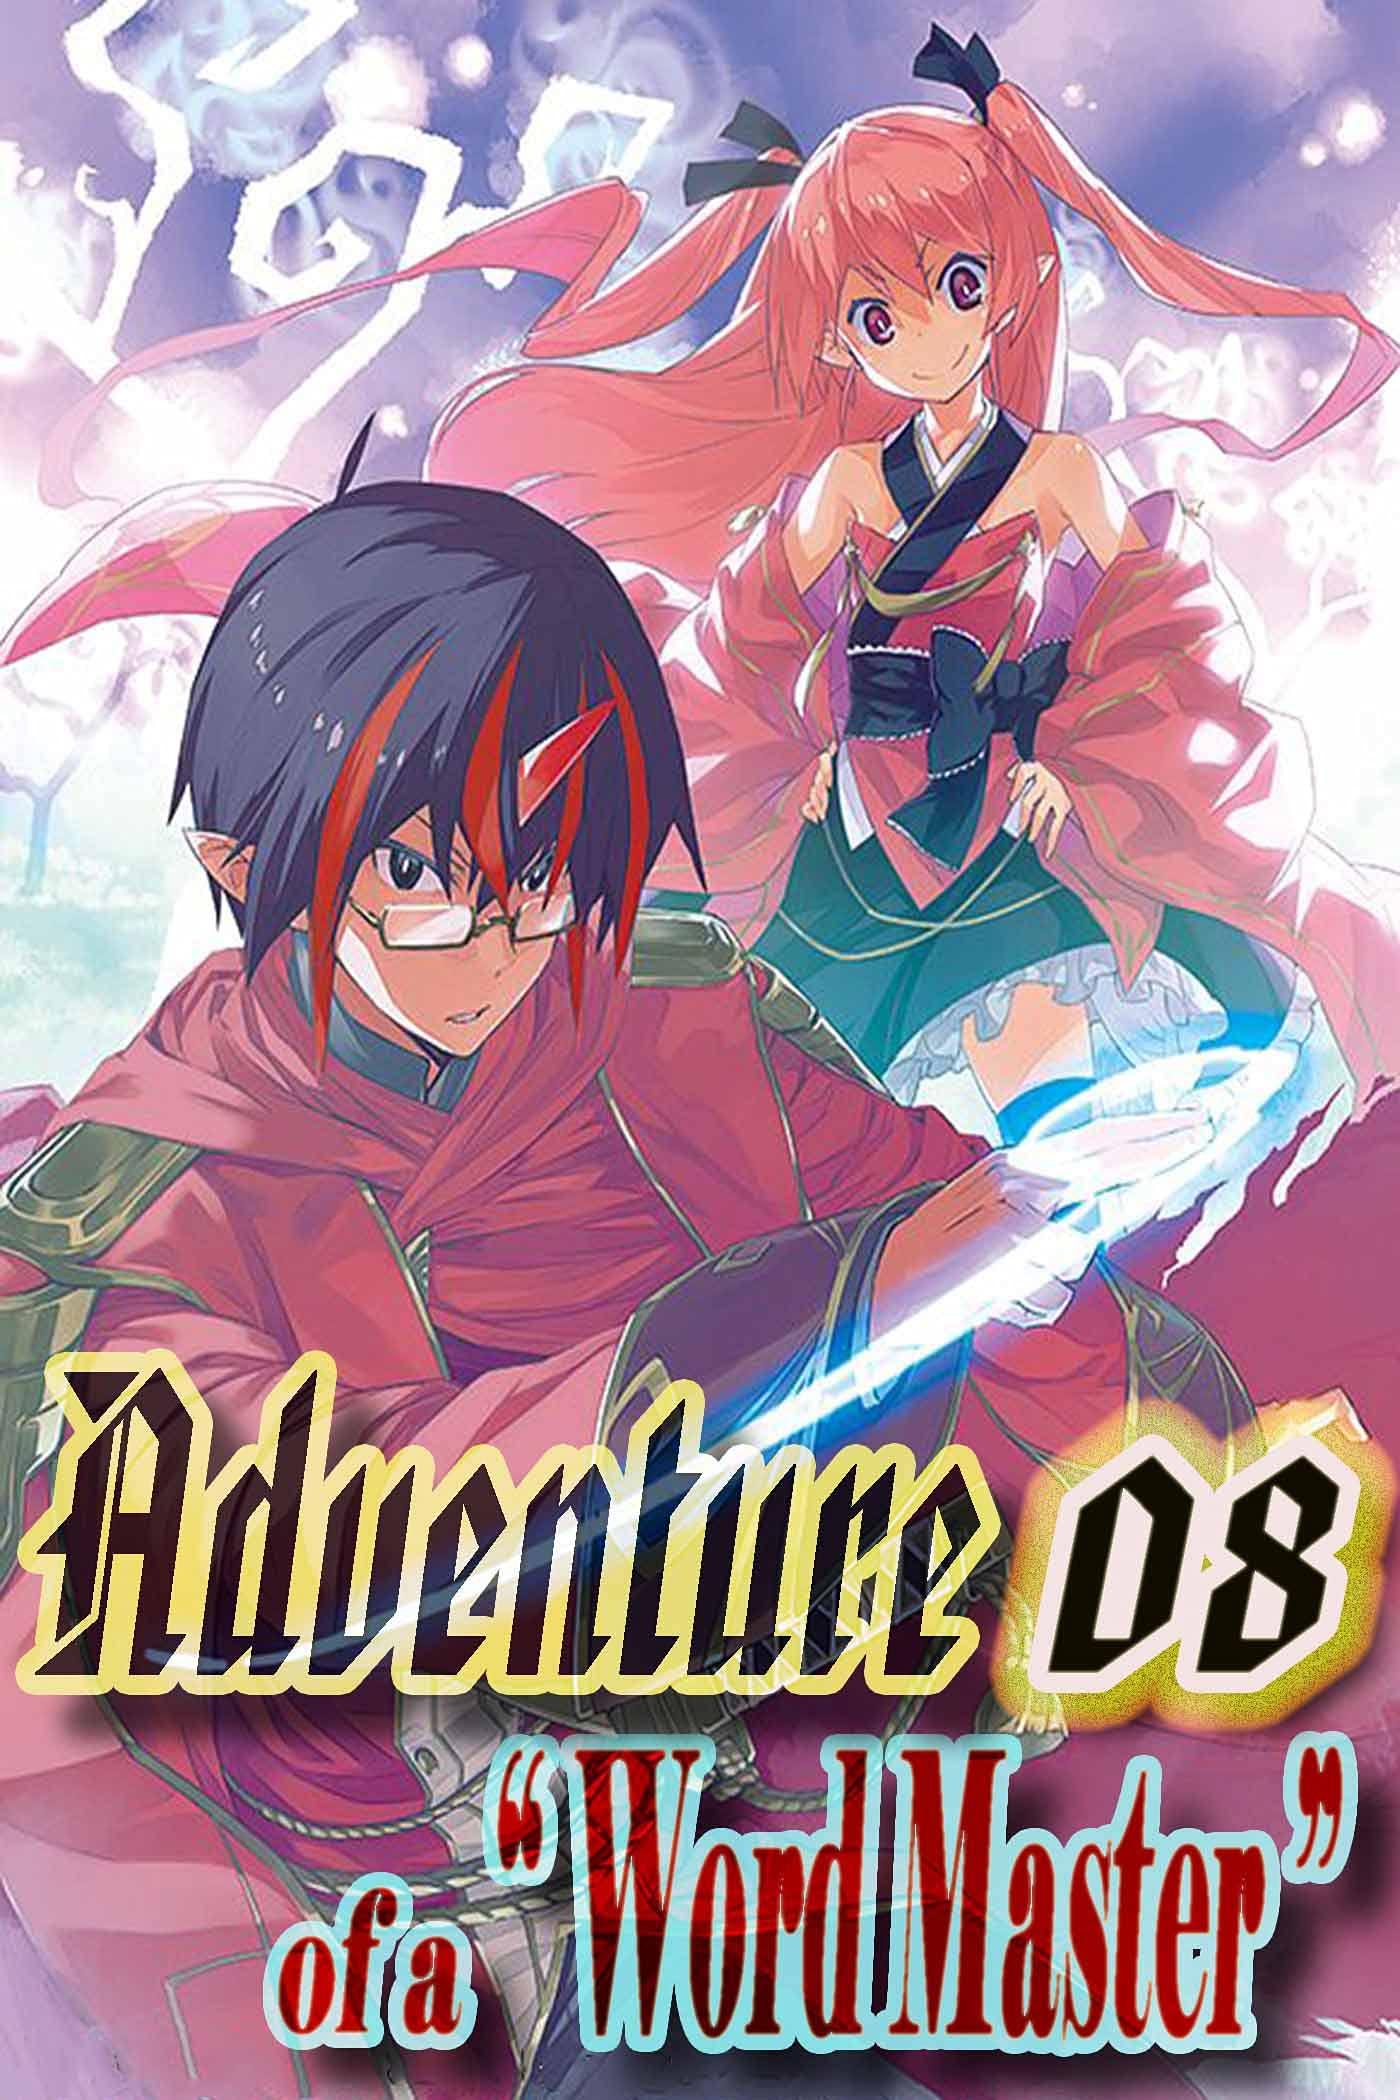 Loner adventure in fantasy World: Unique Class: Word Master Manga Vol 8